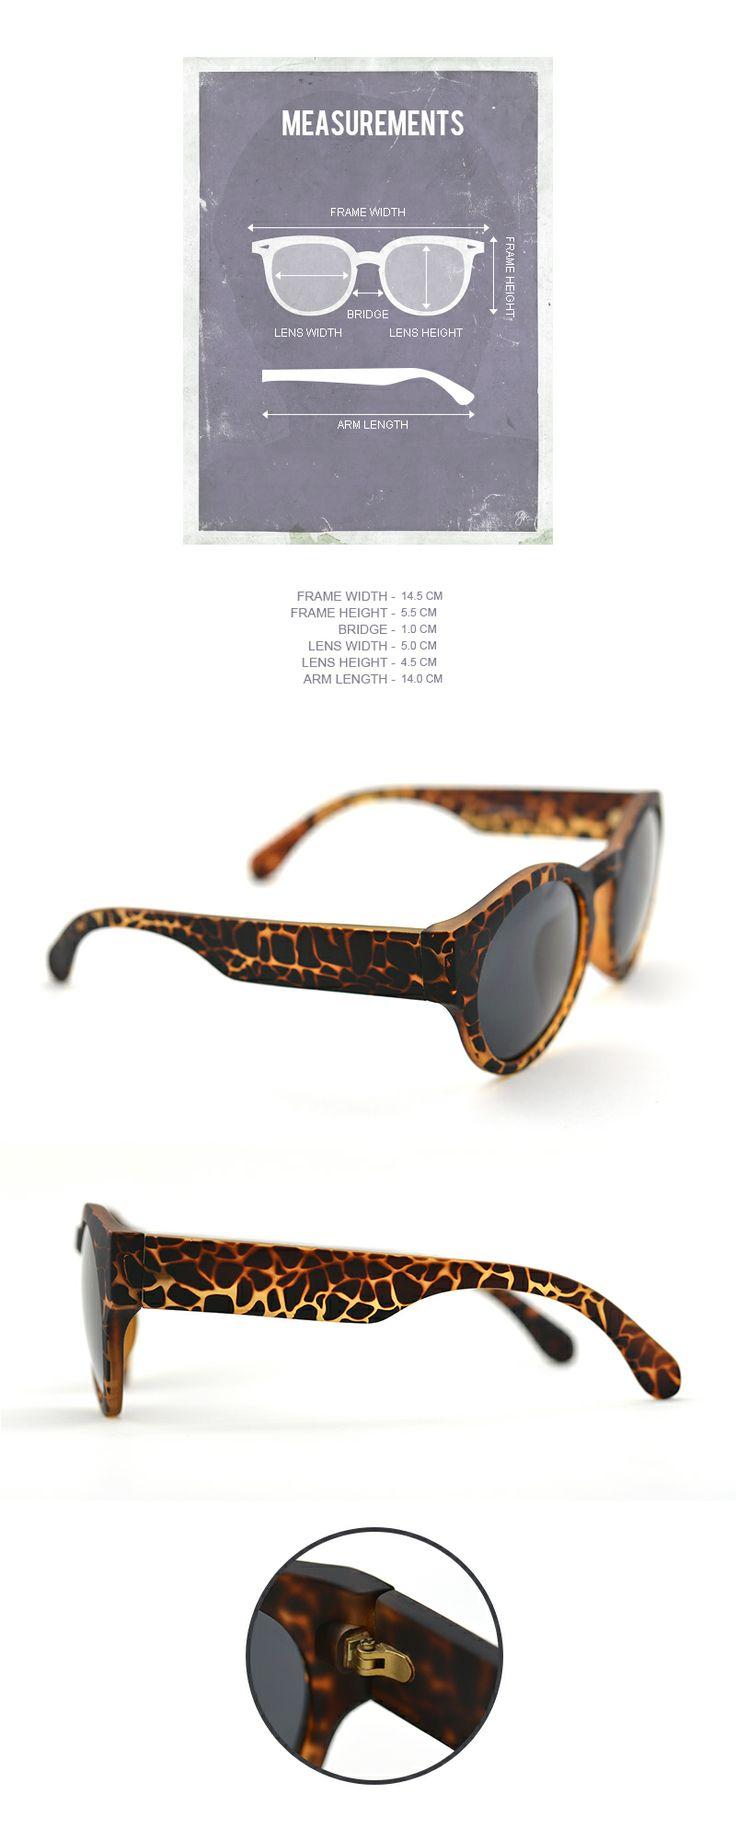 #Suit your face sunglasses Slim face sunglasses round shape leopard print tortoiseshell print #Suit your face #Tortoiseshell Visit - FUNMEMO.COM  to see More